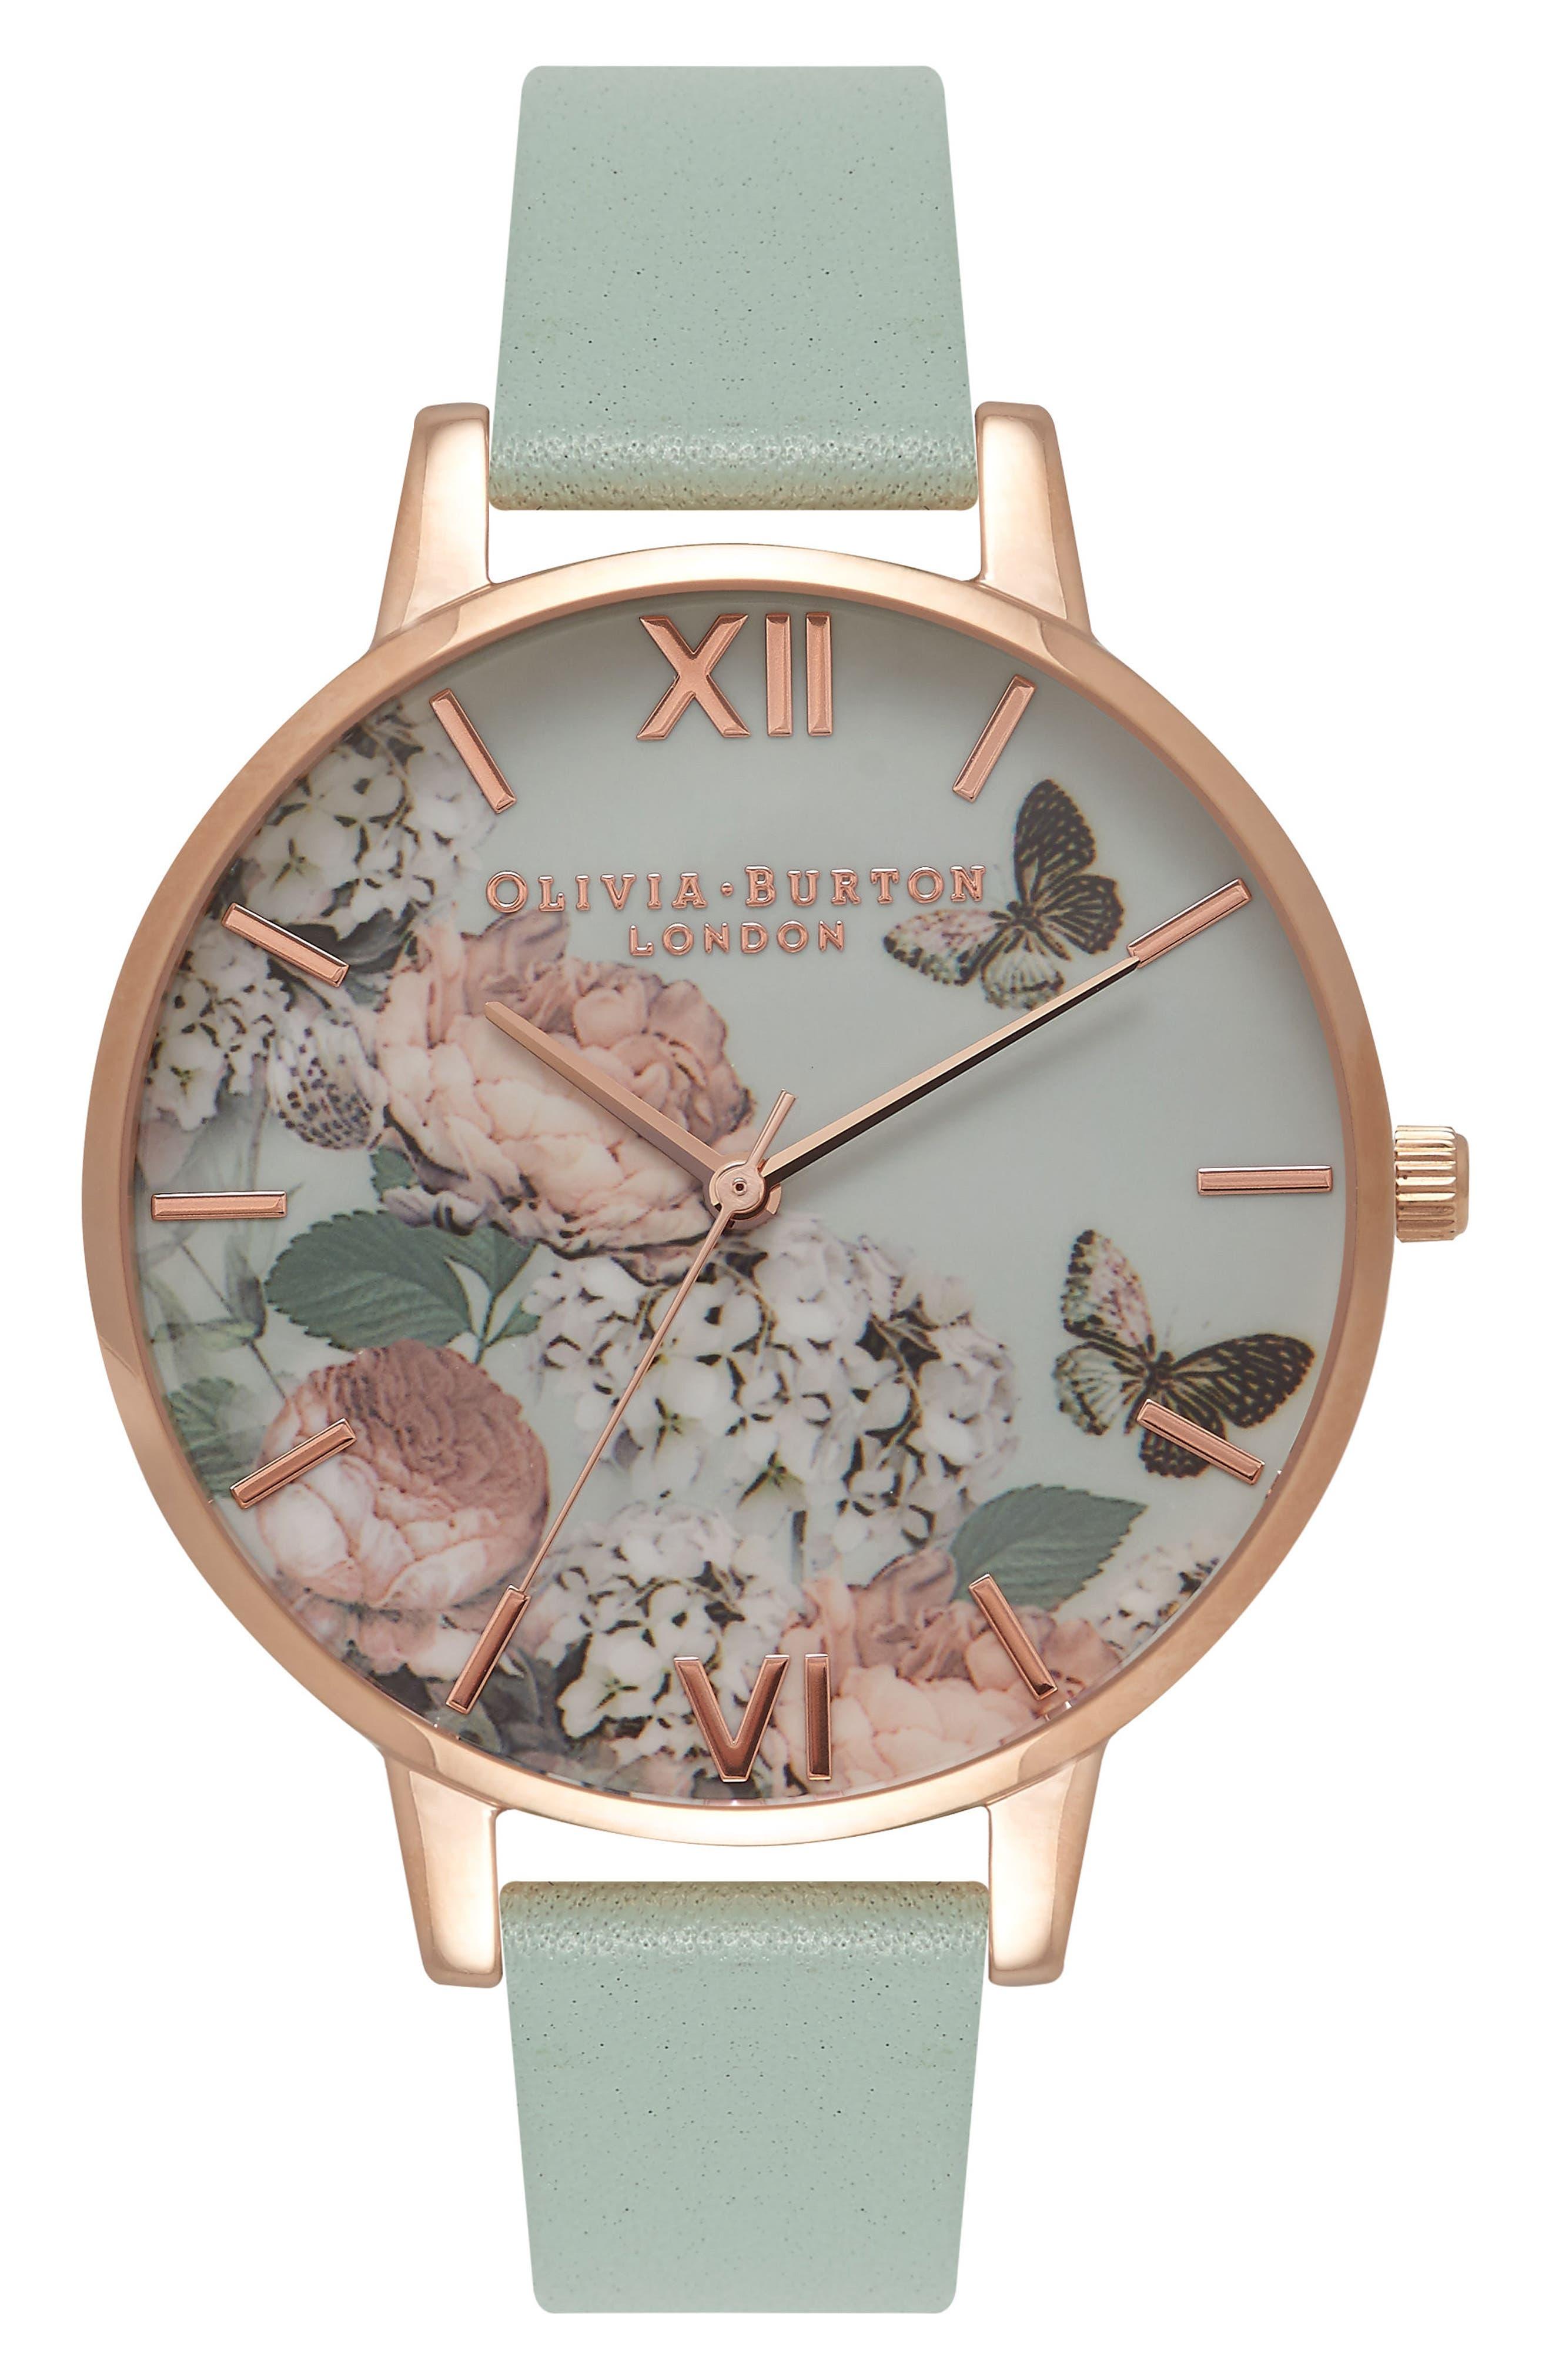 Olivia Burton Women's Olivia Burton Enchanted Garden Leather Strap Watch, 38mm